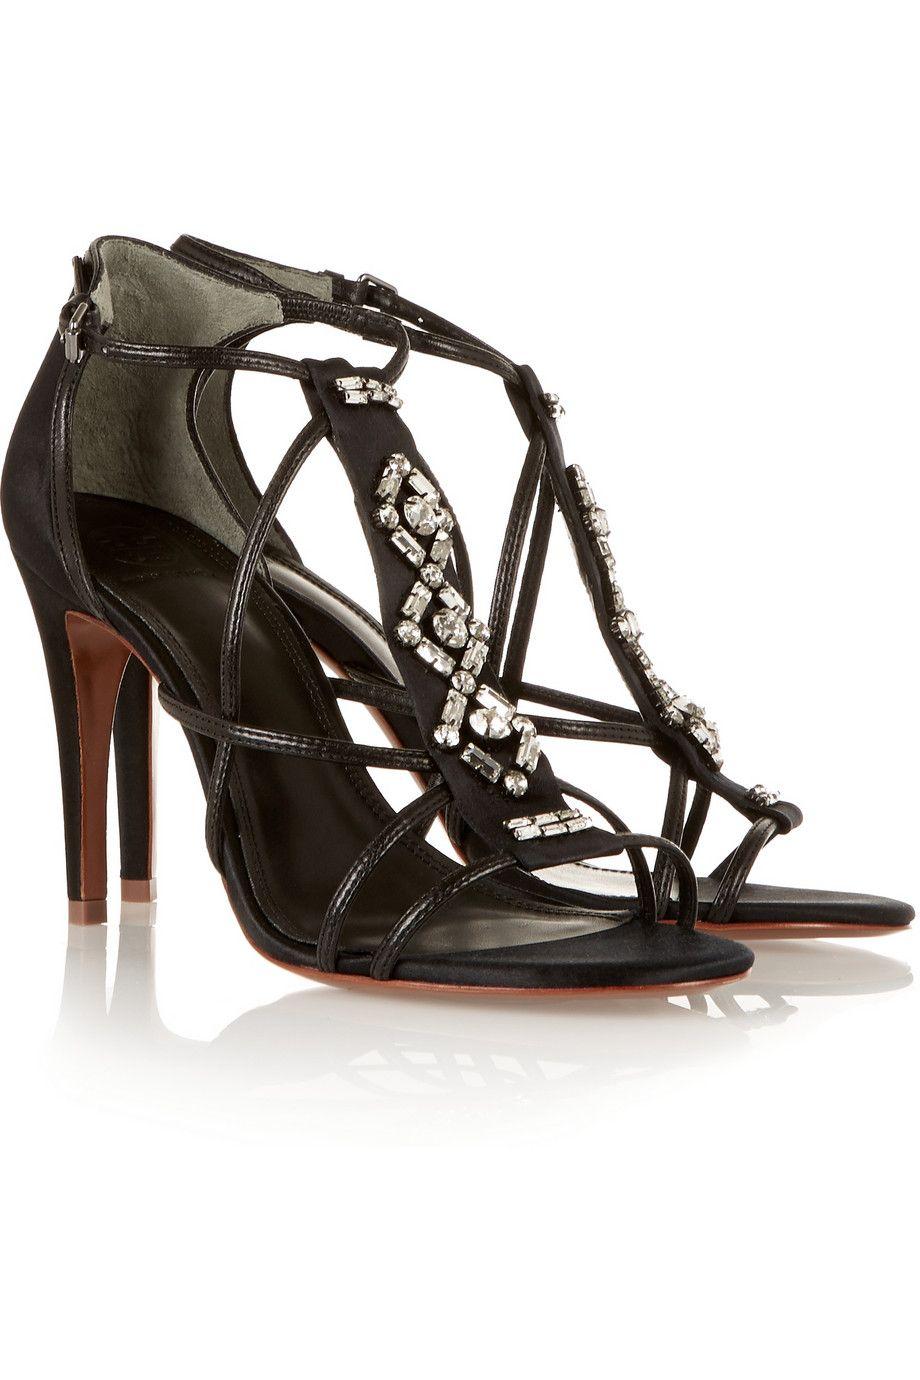 Tory BurchGeralyn crystal-embellished satin sandals